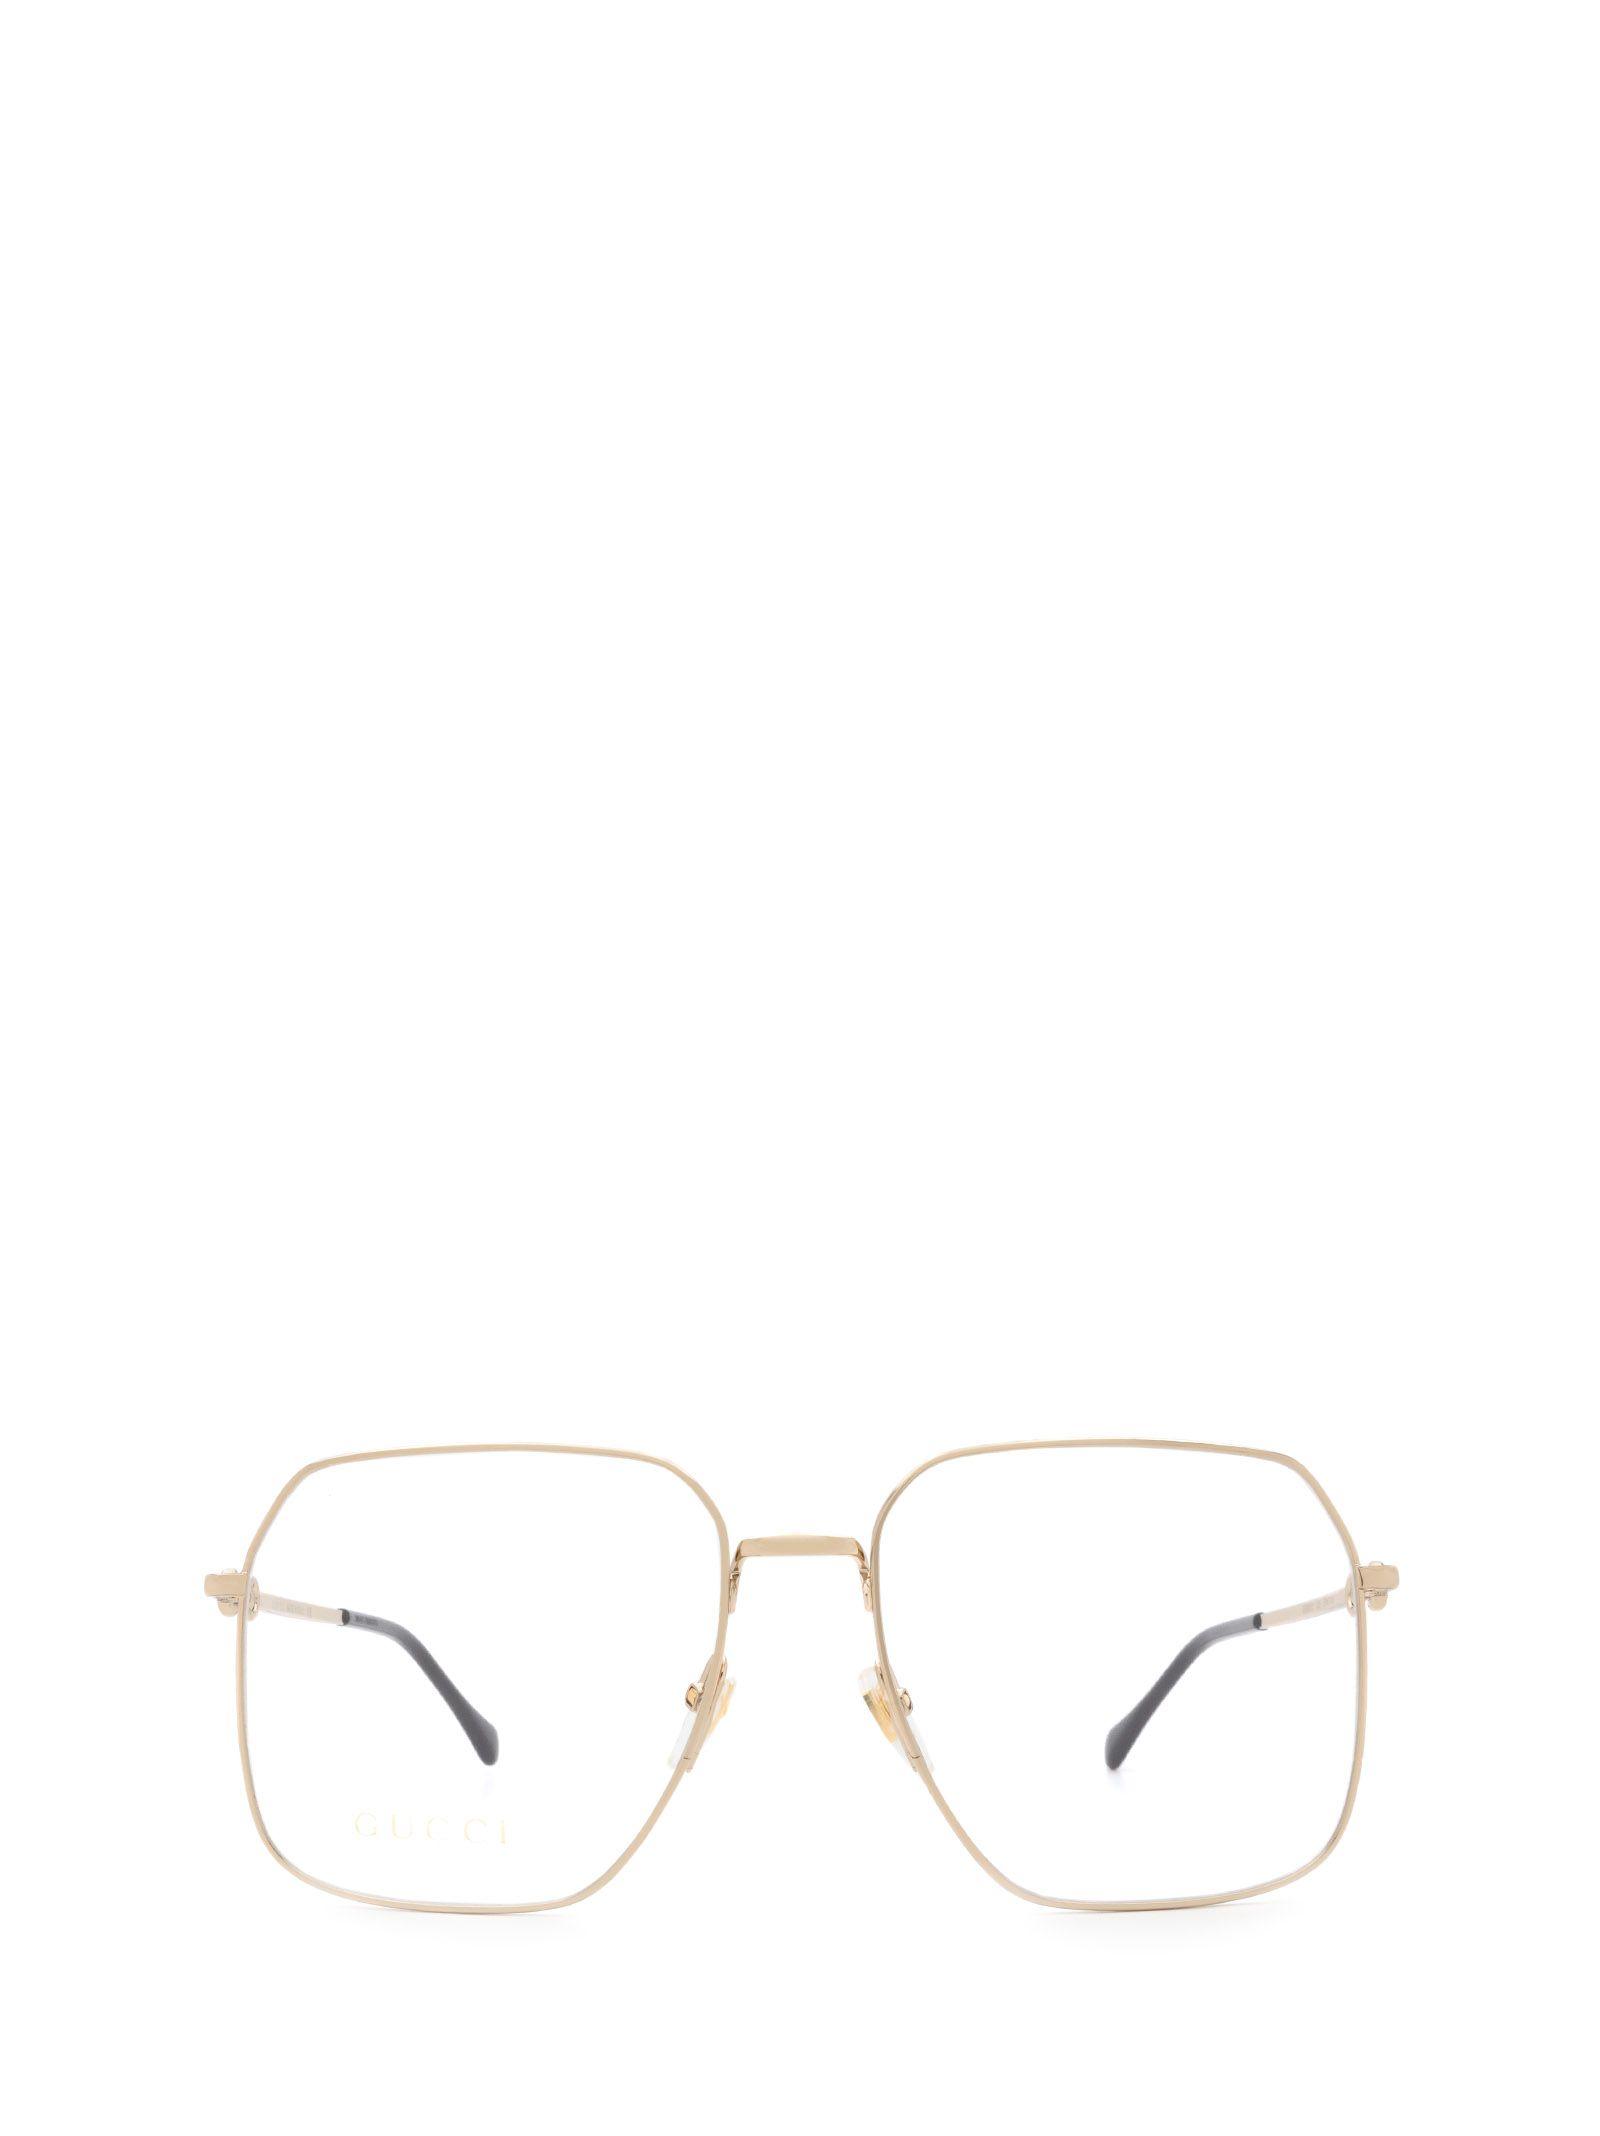 Gucci Opticals GUCCI WOMEN'S MULTICOLOR METAL GLASSES